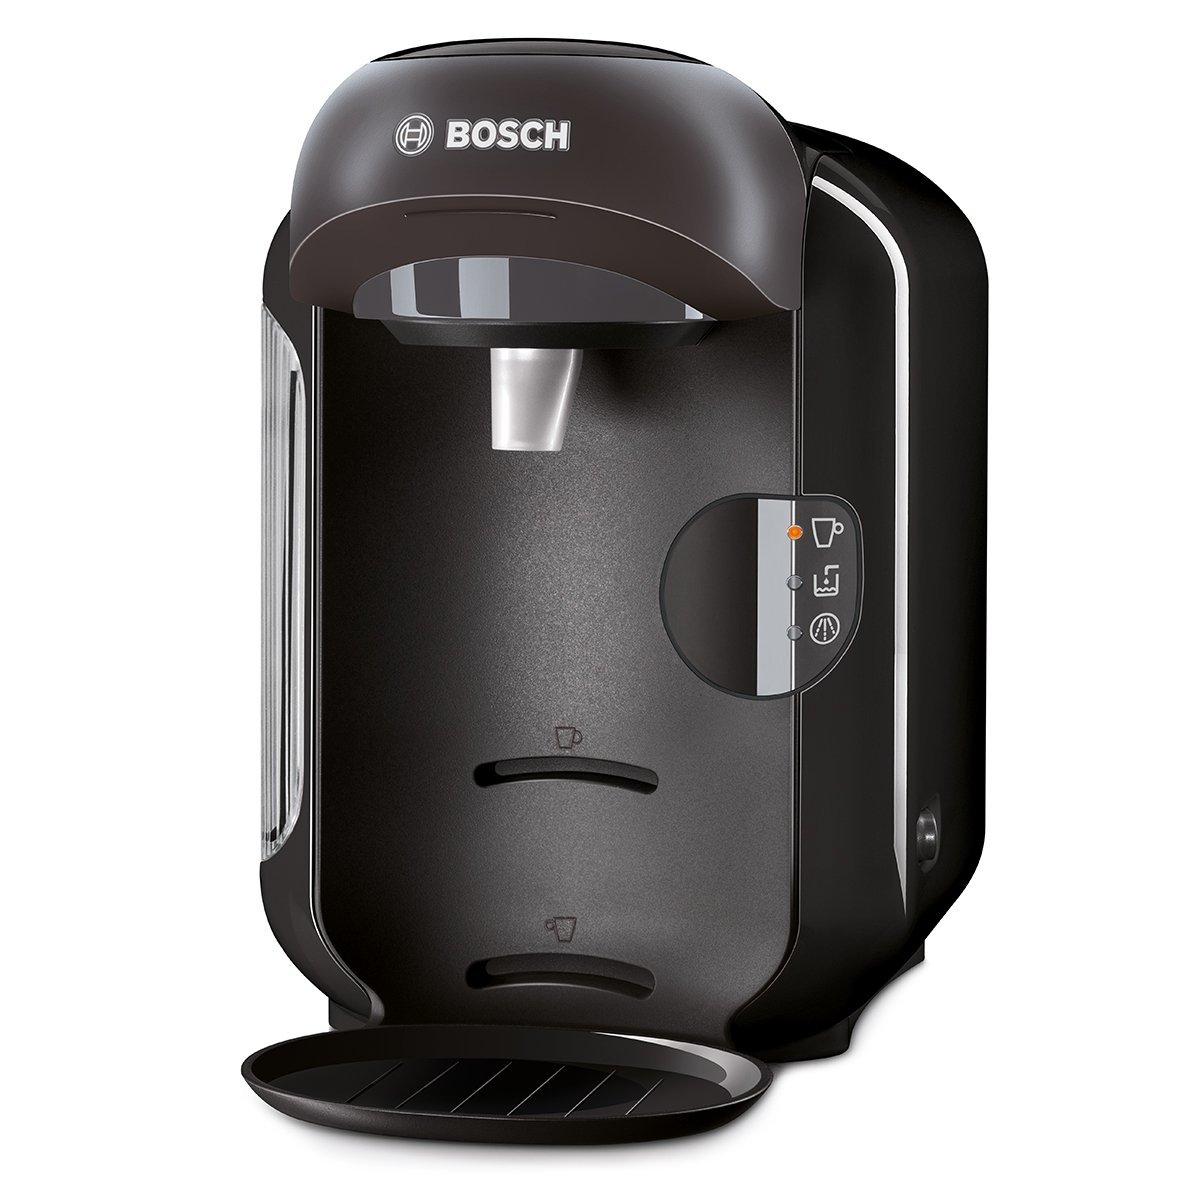 Bosch-TAS1252-Tassimo-Multi-Getränke-Automat-VIVY3 Tassimo VIVY